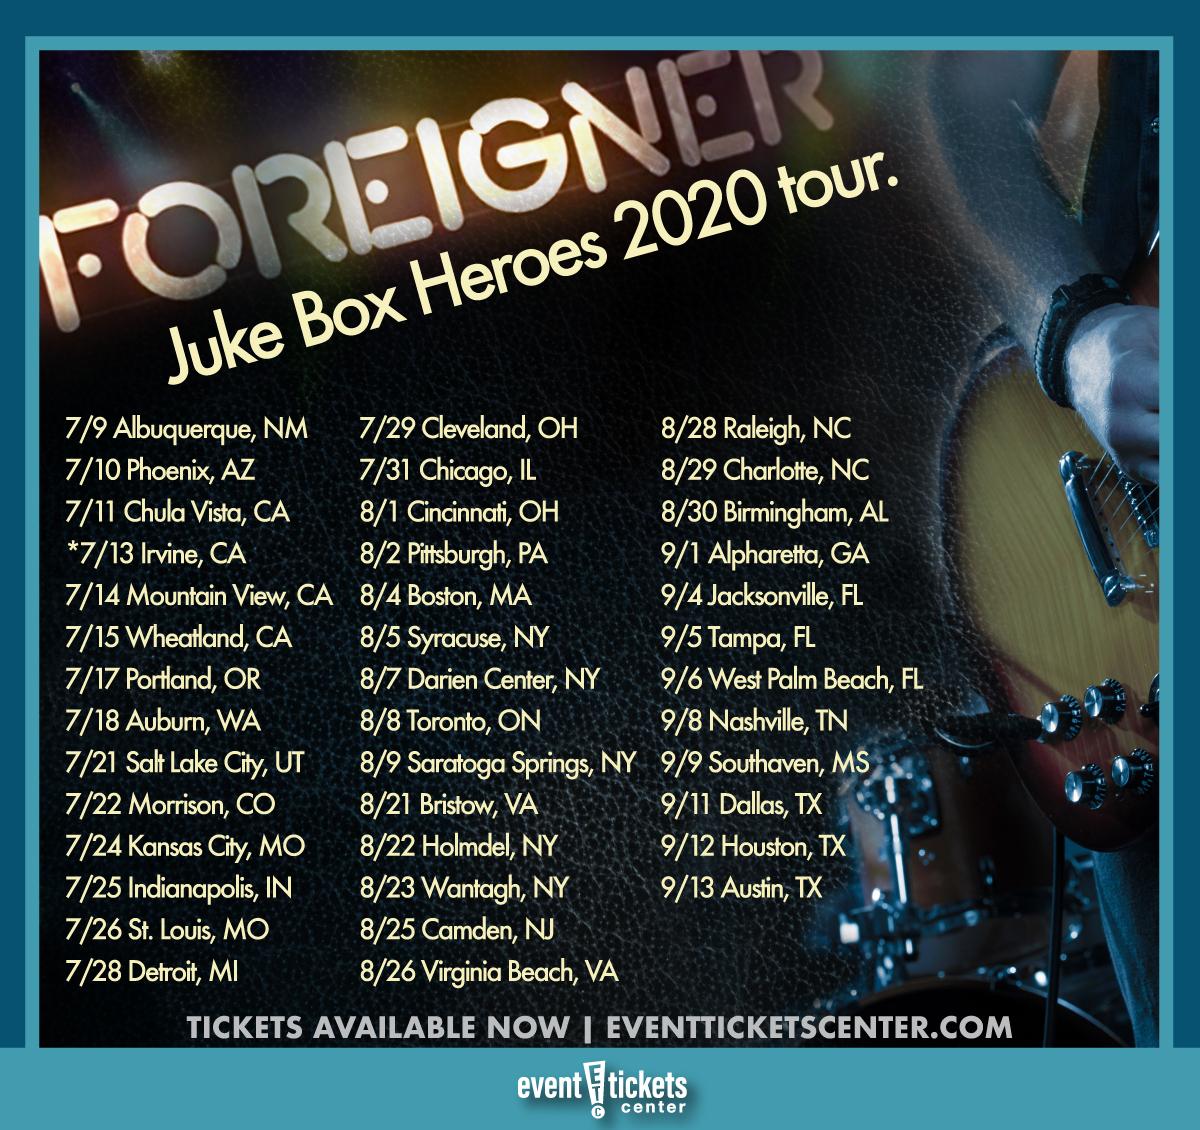 Concert Tour: Foreigner With Kansas Juke Box Heroes Tour